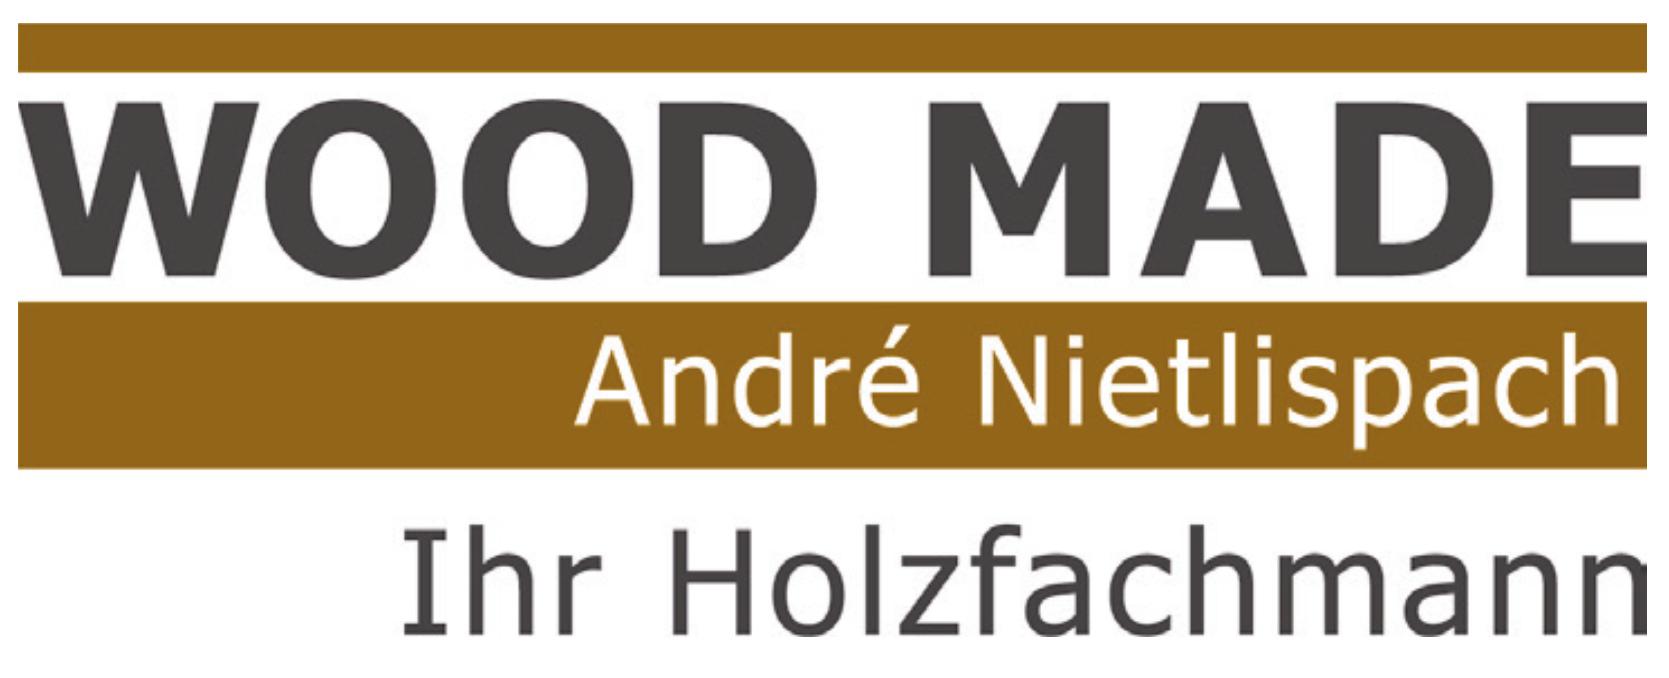 WOODMADE.CH